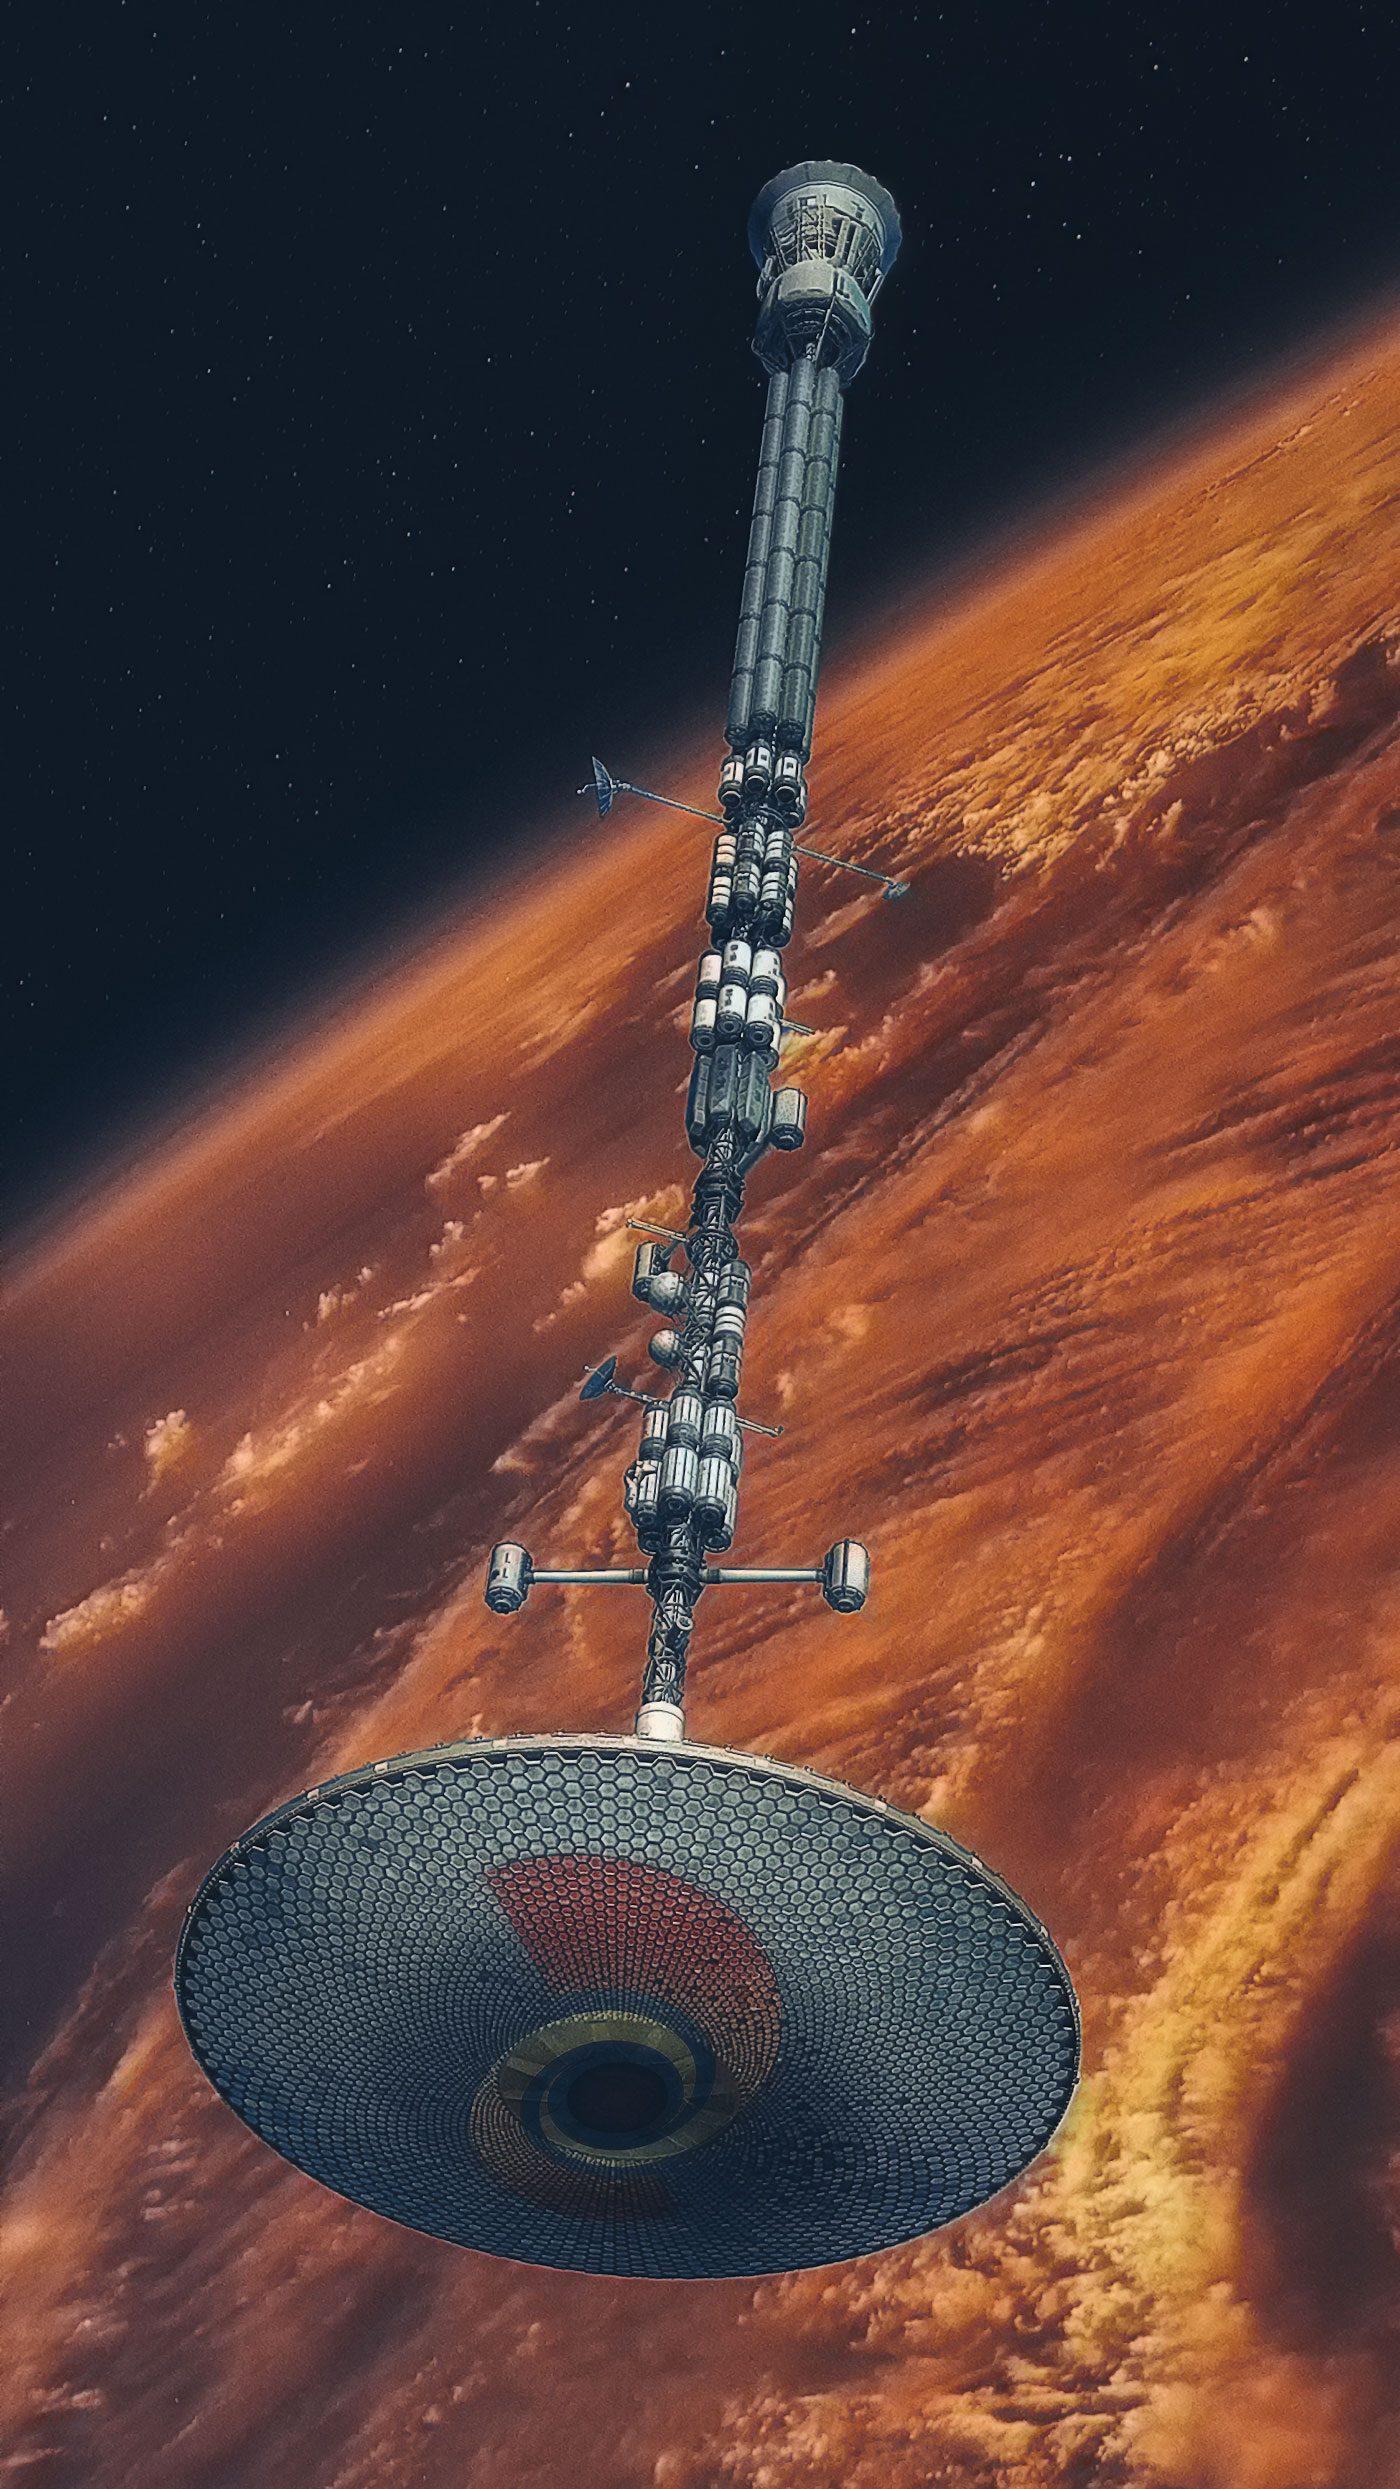 Candal SAR spaceship